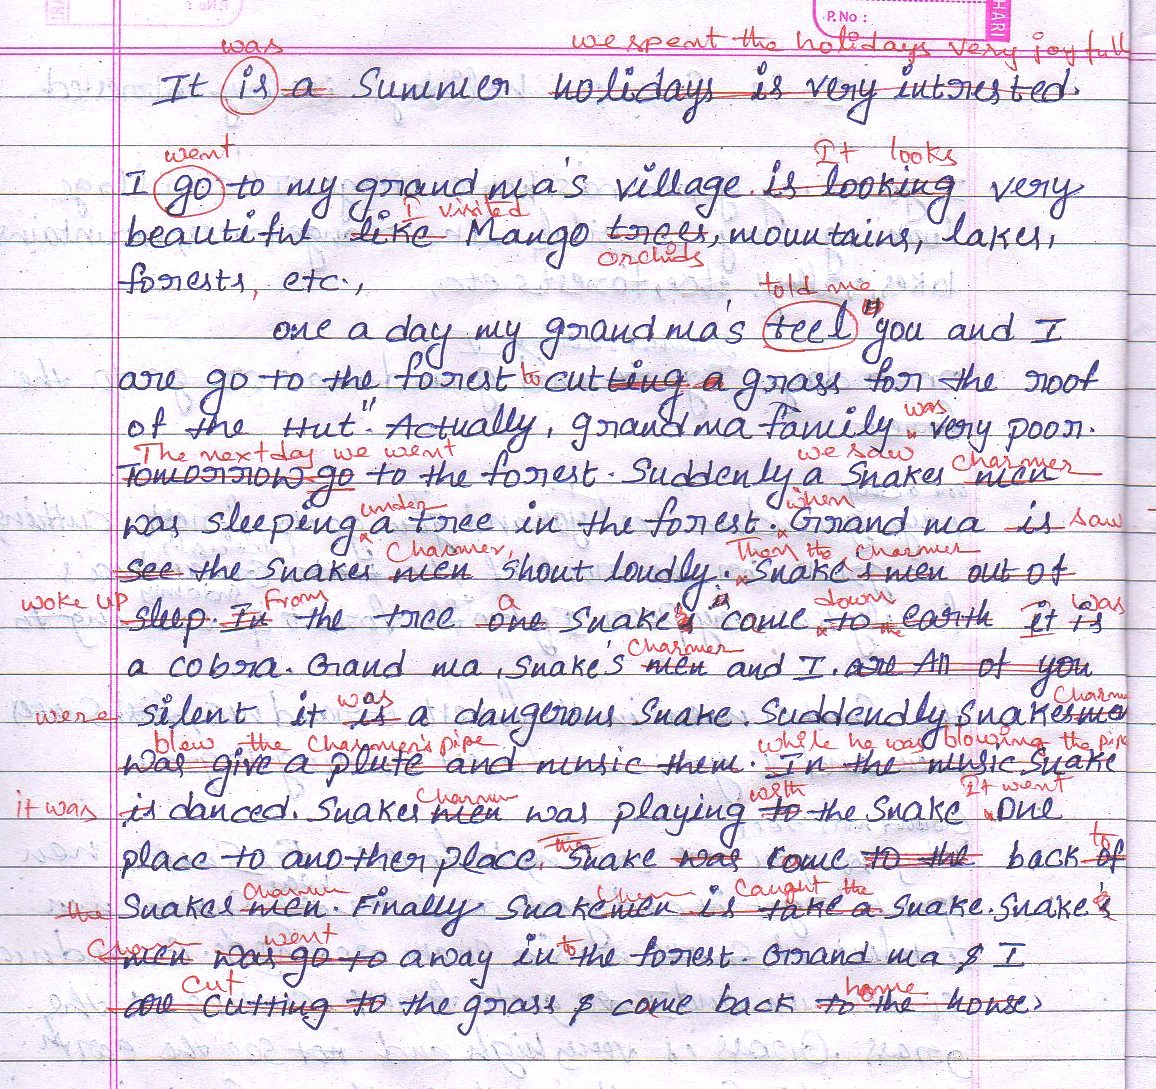 descriptive essay about classroom My classroom essay- an english essay on my classroom for kids of class 1 to 5 my classroom essay- an english essay on my classroom for kids of class 1 to 5.